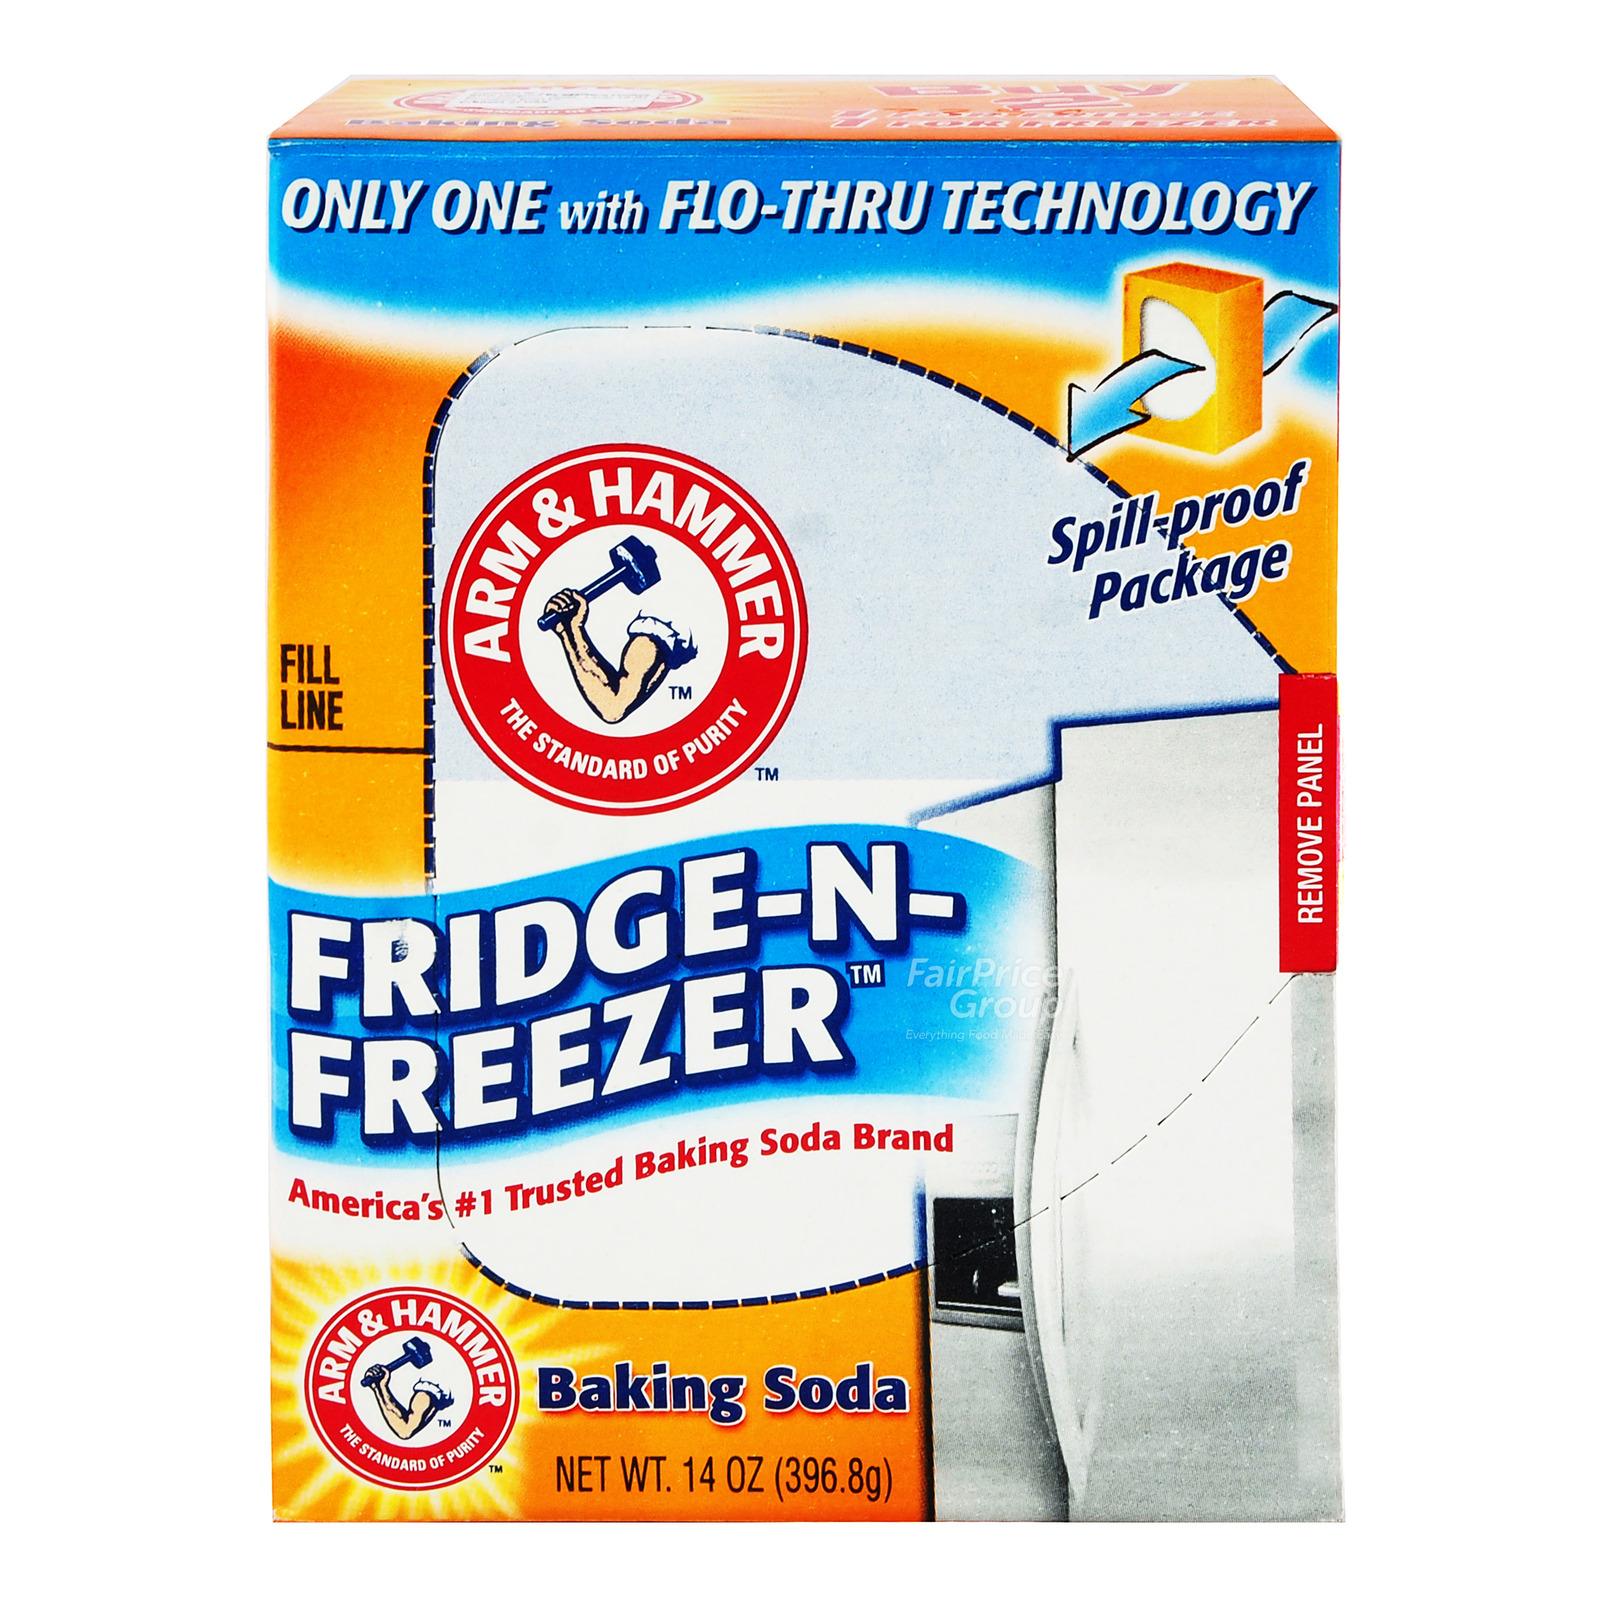 Arm & Hammer Baking Soda - Fridge-N-Freezer